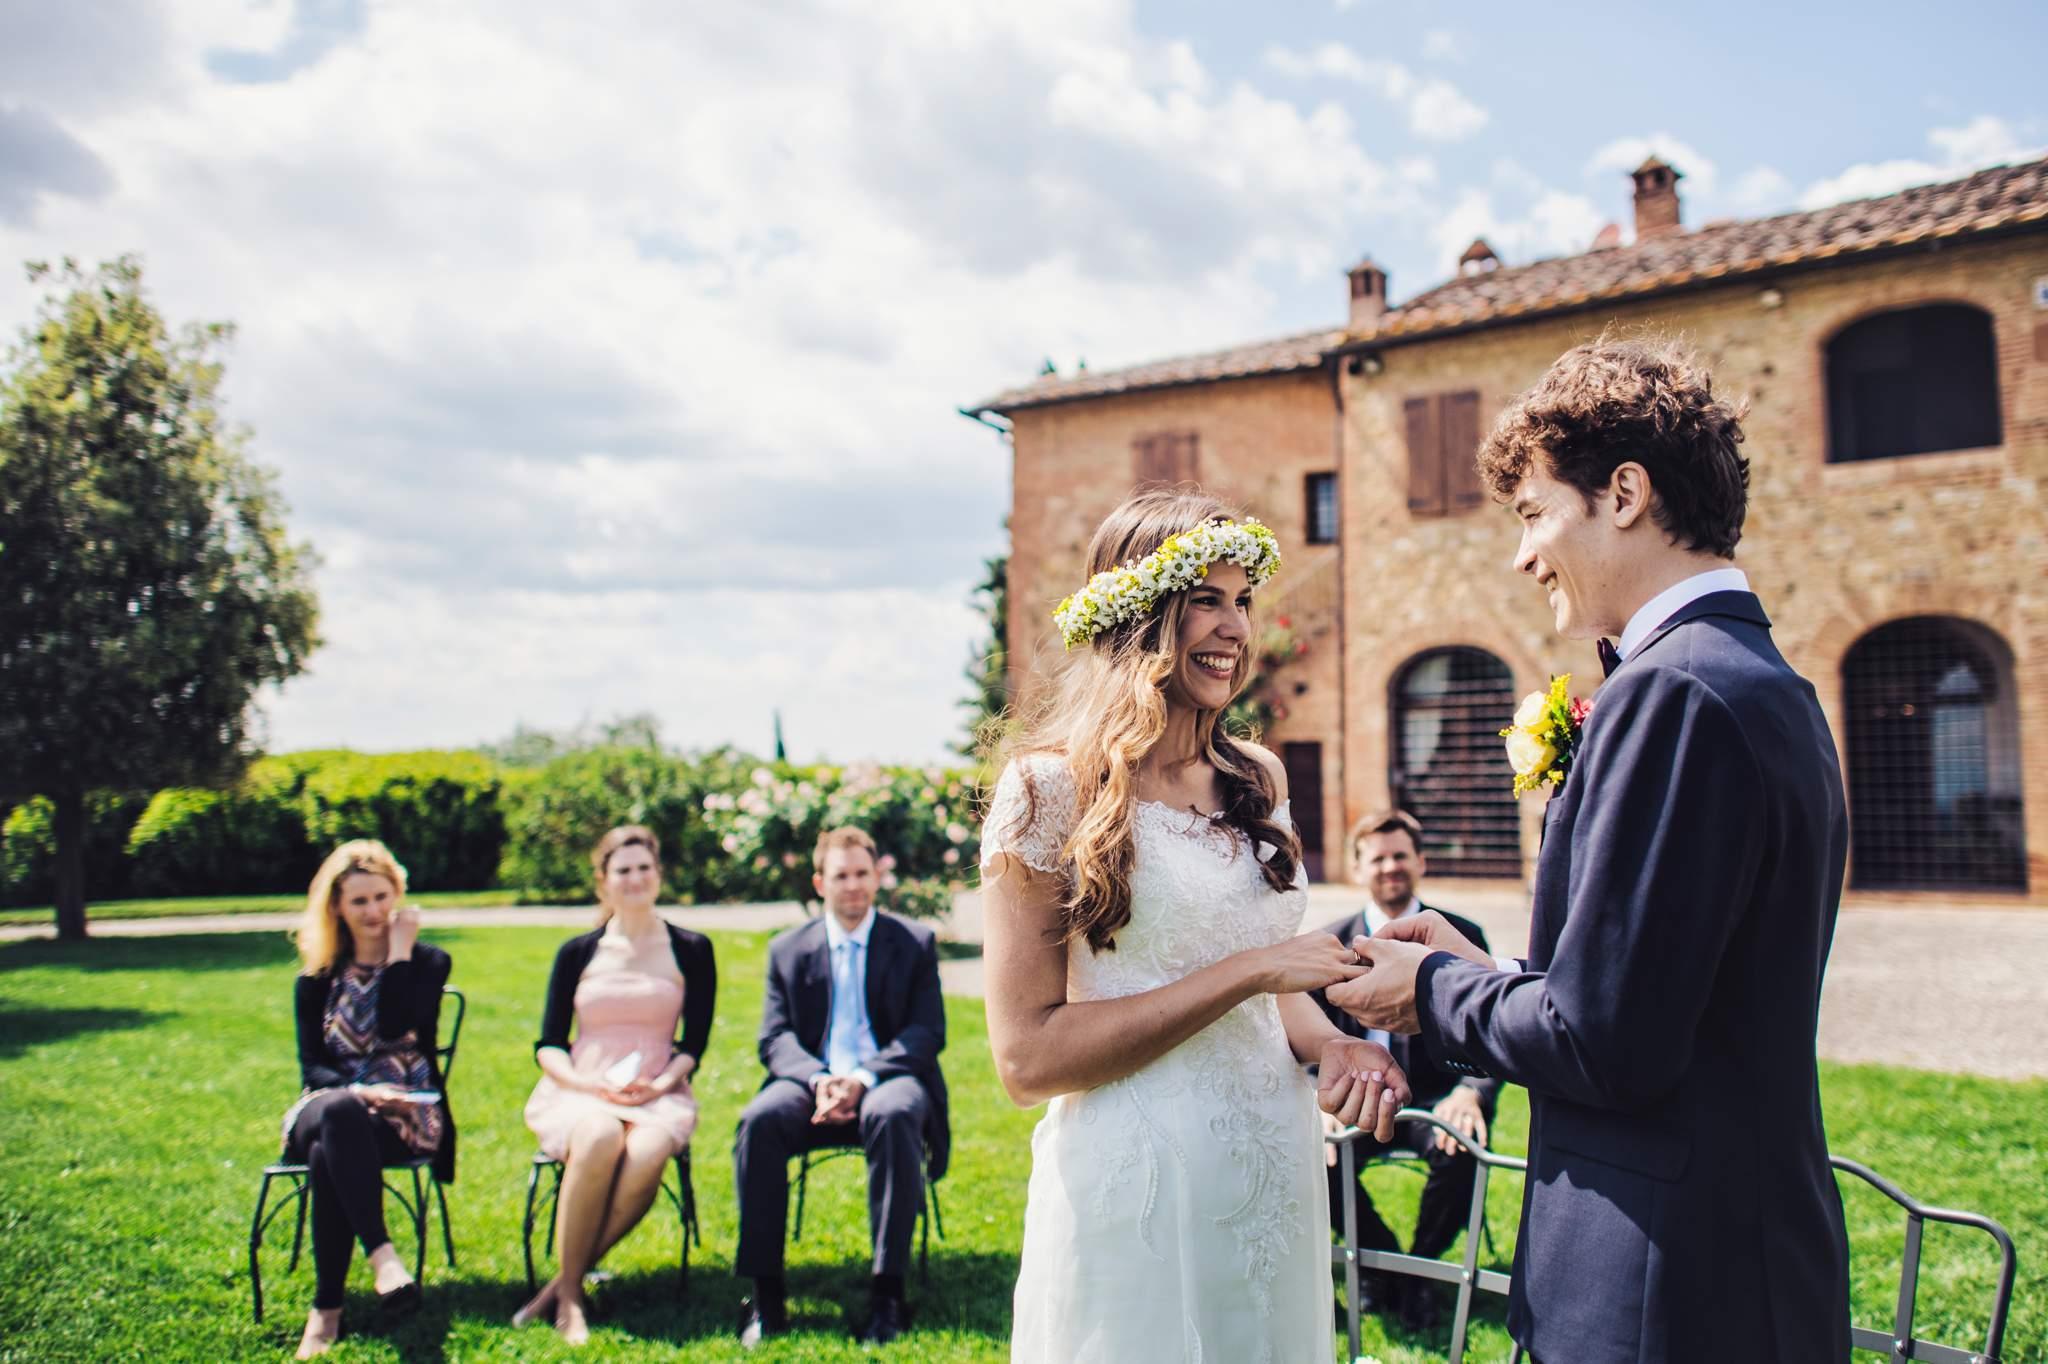 18wedding-photographer-tuscany-siena